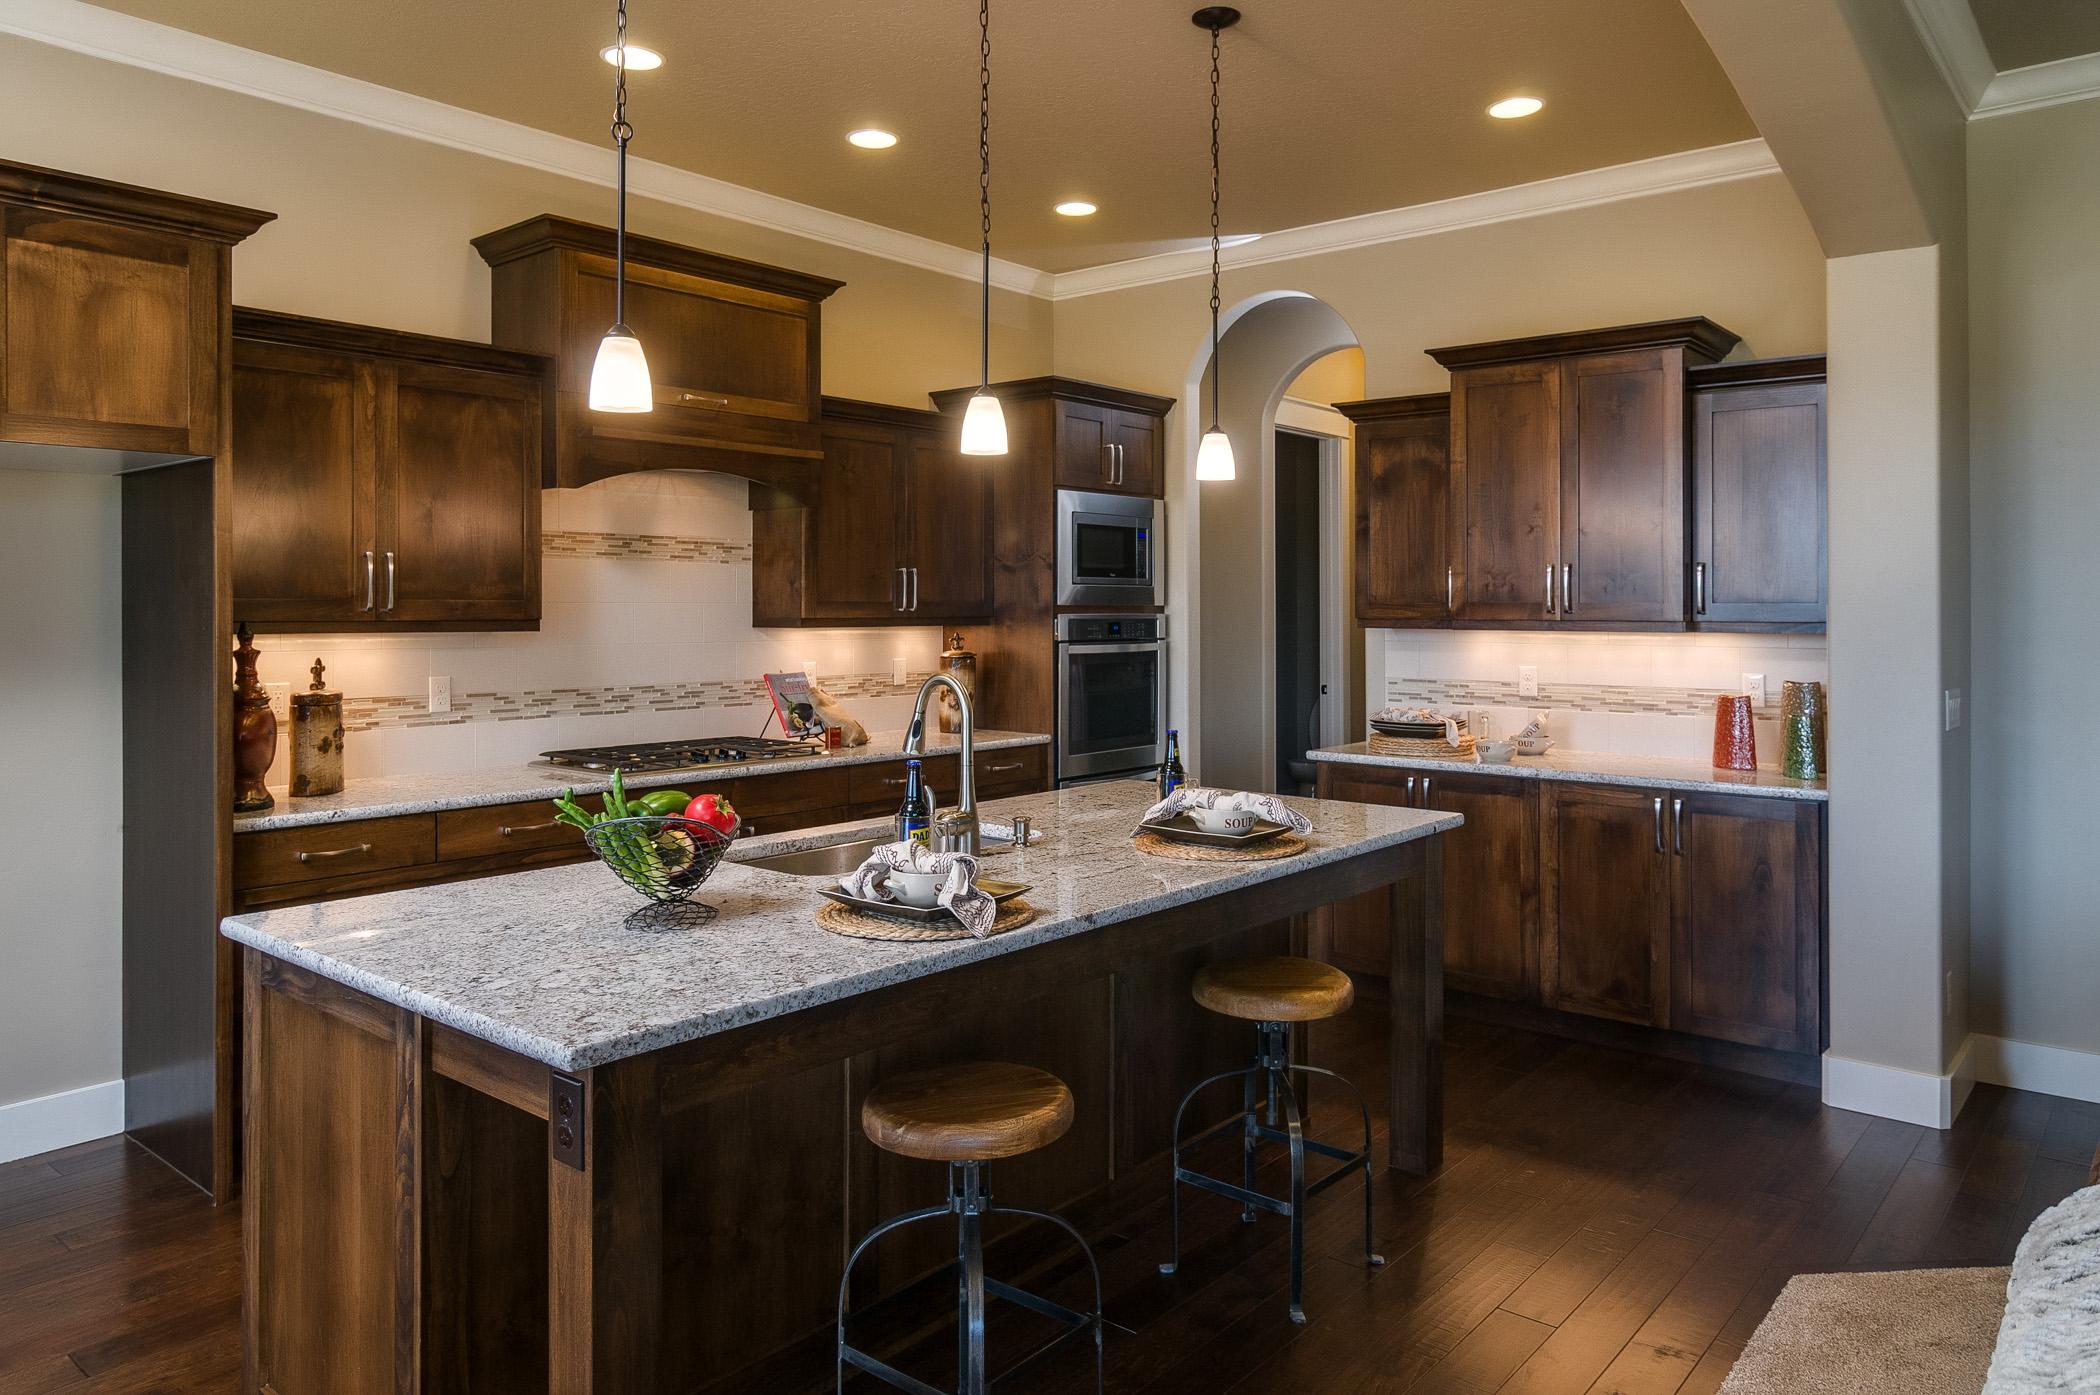 Capell Flooring and Interiors  Boise  Carpet  Hardwood